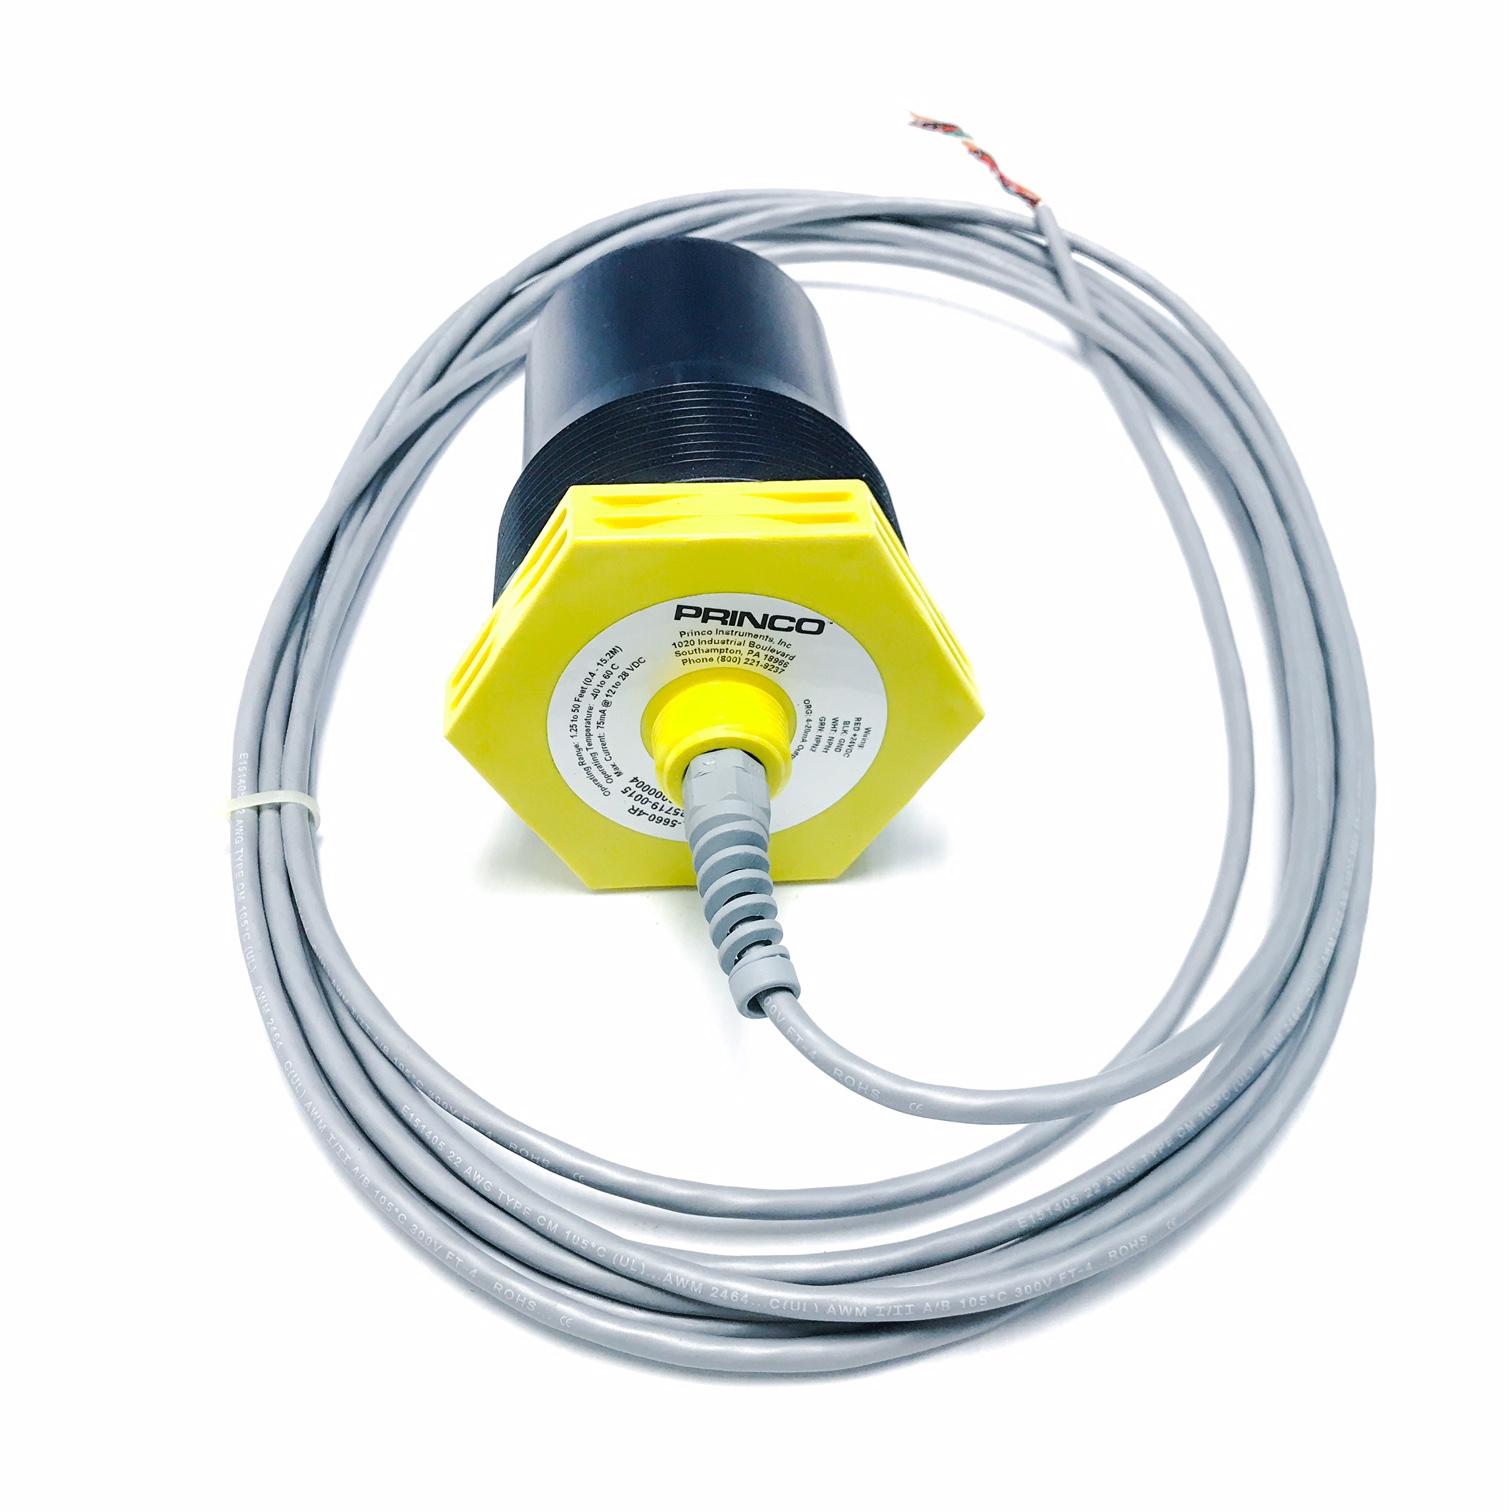 4 wire ultrasonic level transmitter pioneer deh p8400bh wiring diagram l 5660 4r princo